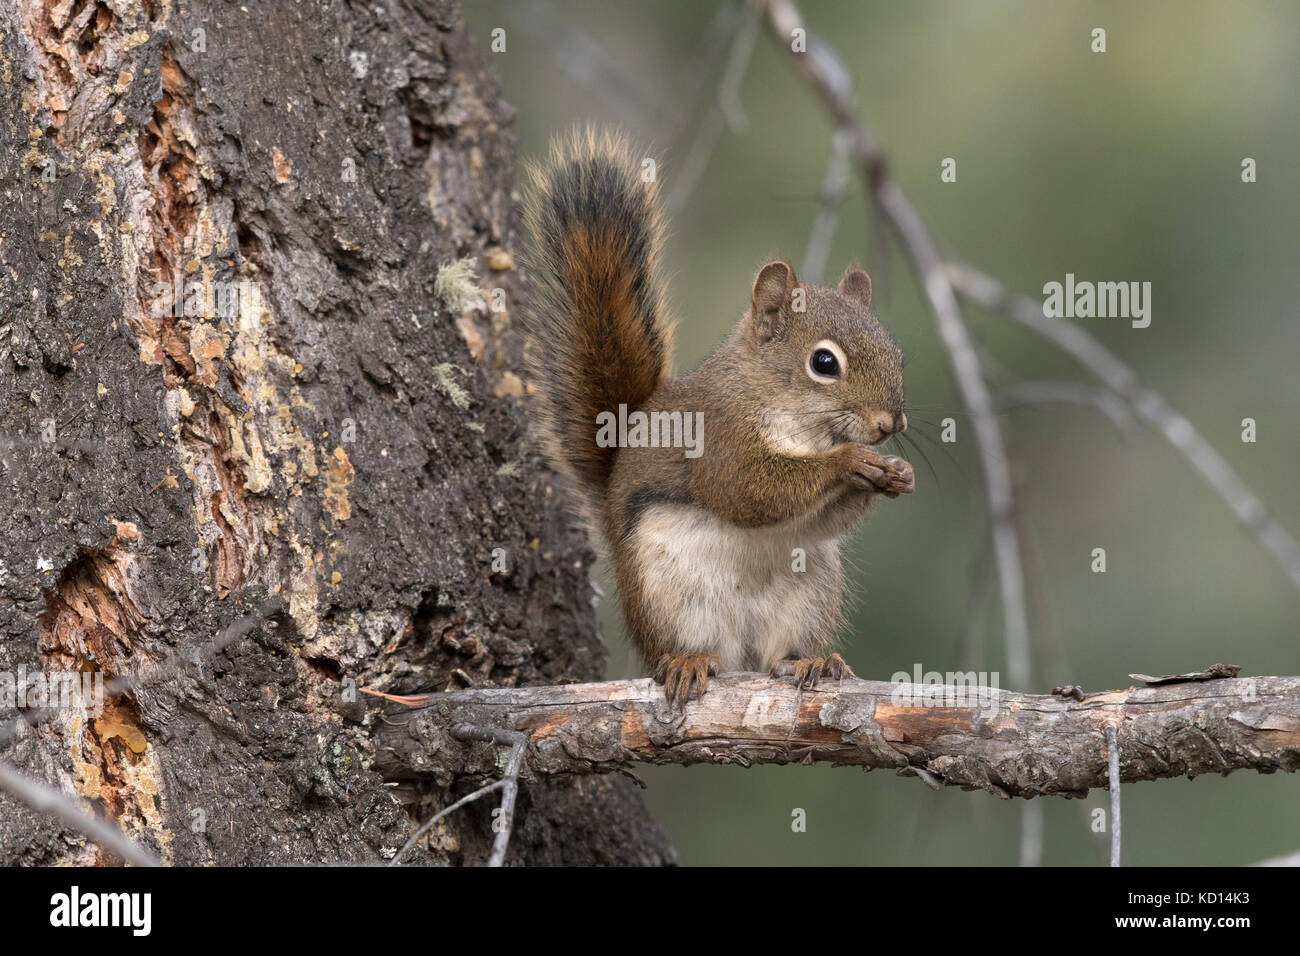 Red Squirrel sitting on branch looking at viewer. (Tamiasciurus hudsonicus).  Alberta, Canada. - Stock Image